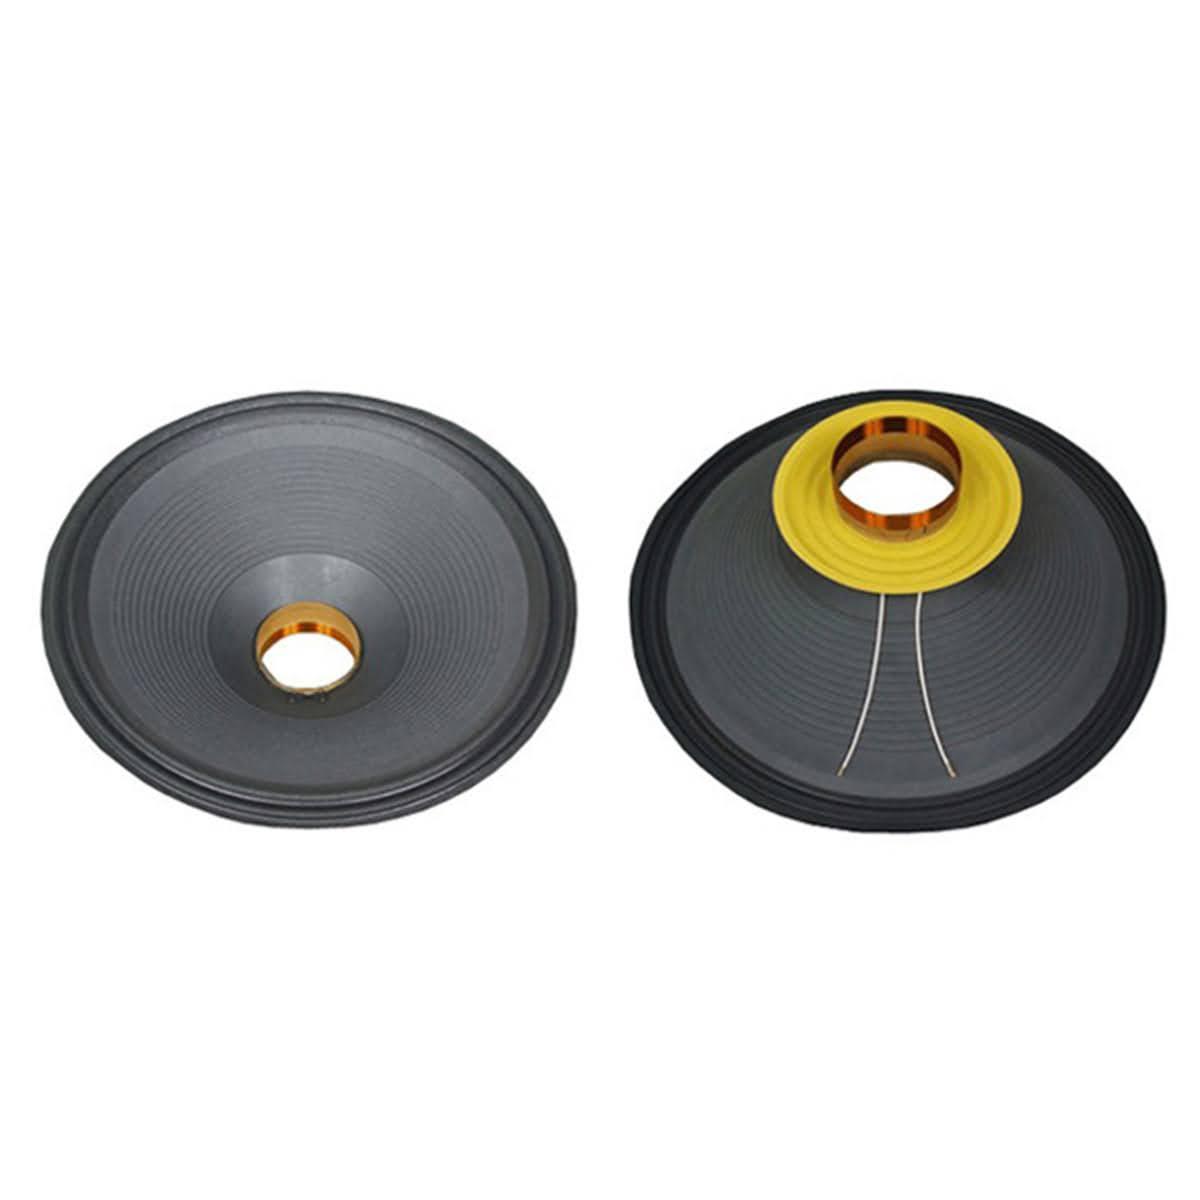 "Reparo Alto Falante 12"" - 550w12 (8 Ohms) - Oversound  - RS Som e Luz!"